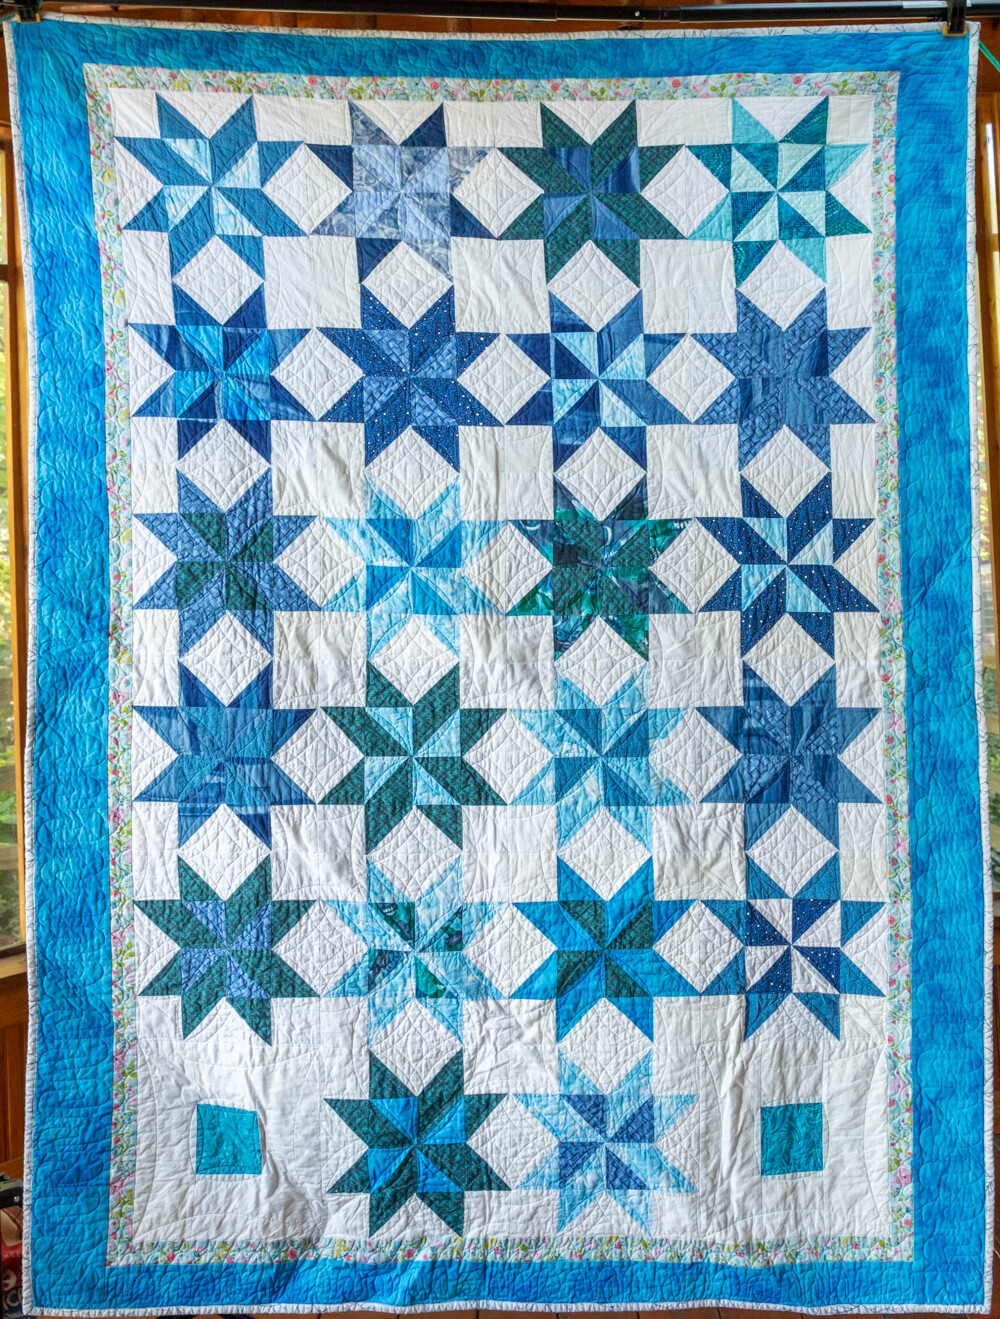 Quilt #20 - Blue Stars